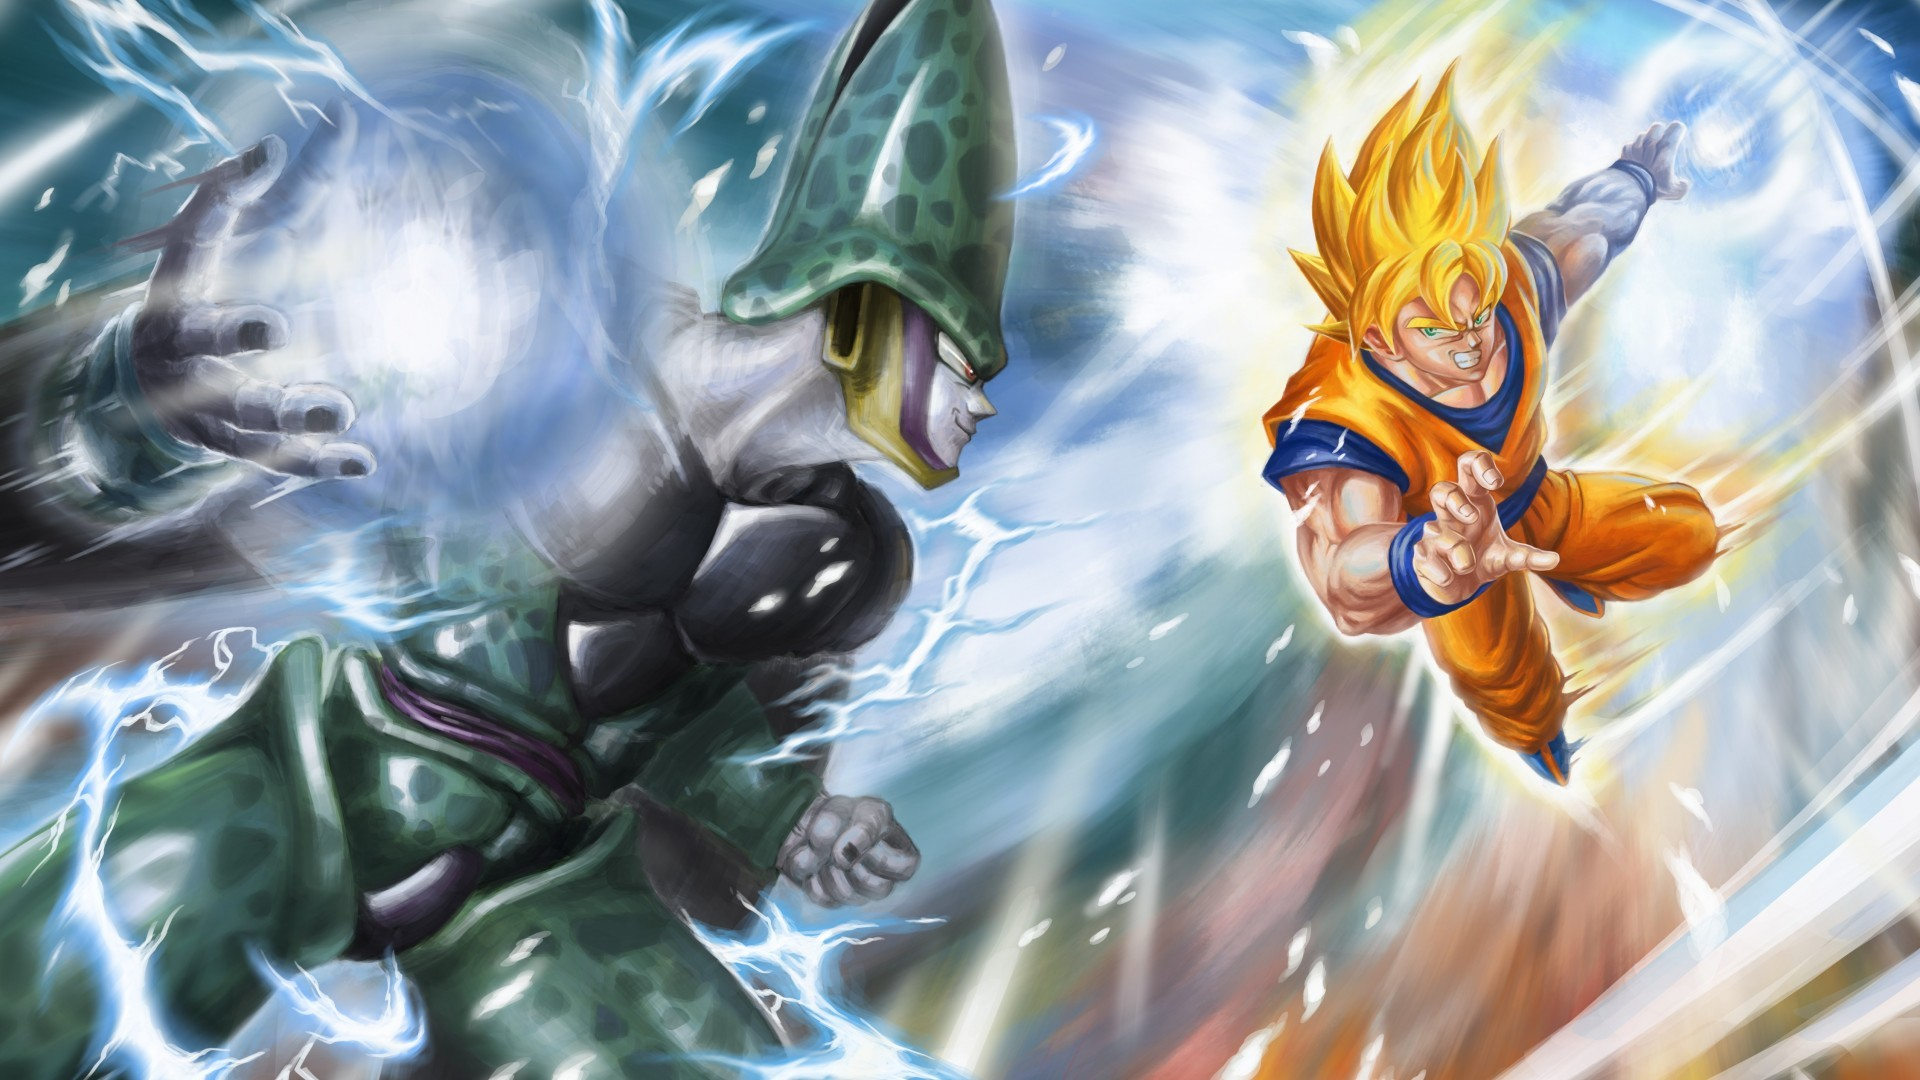 Hd Dragon Ball Z Wallpaper 72 Pictures